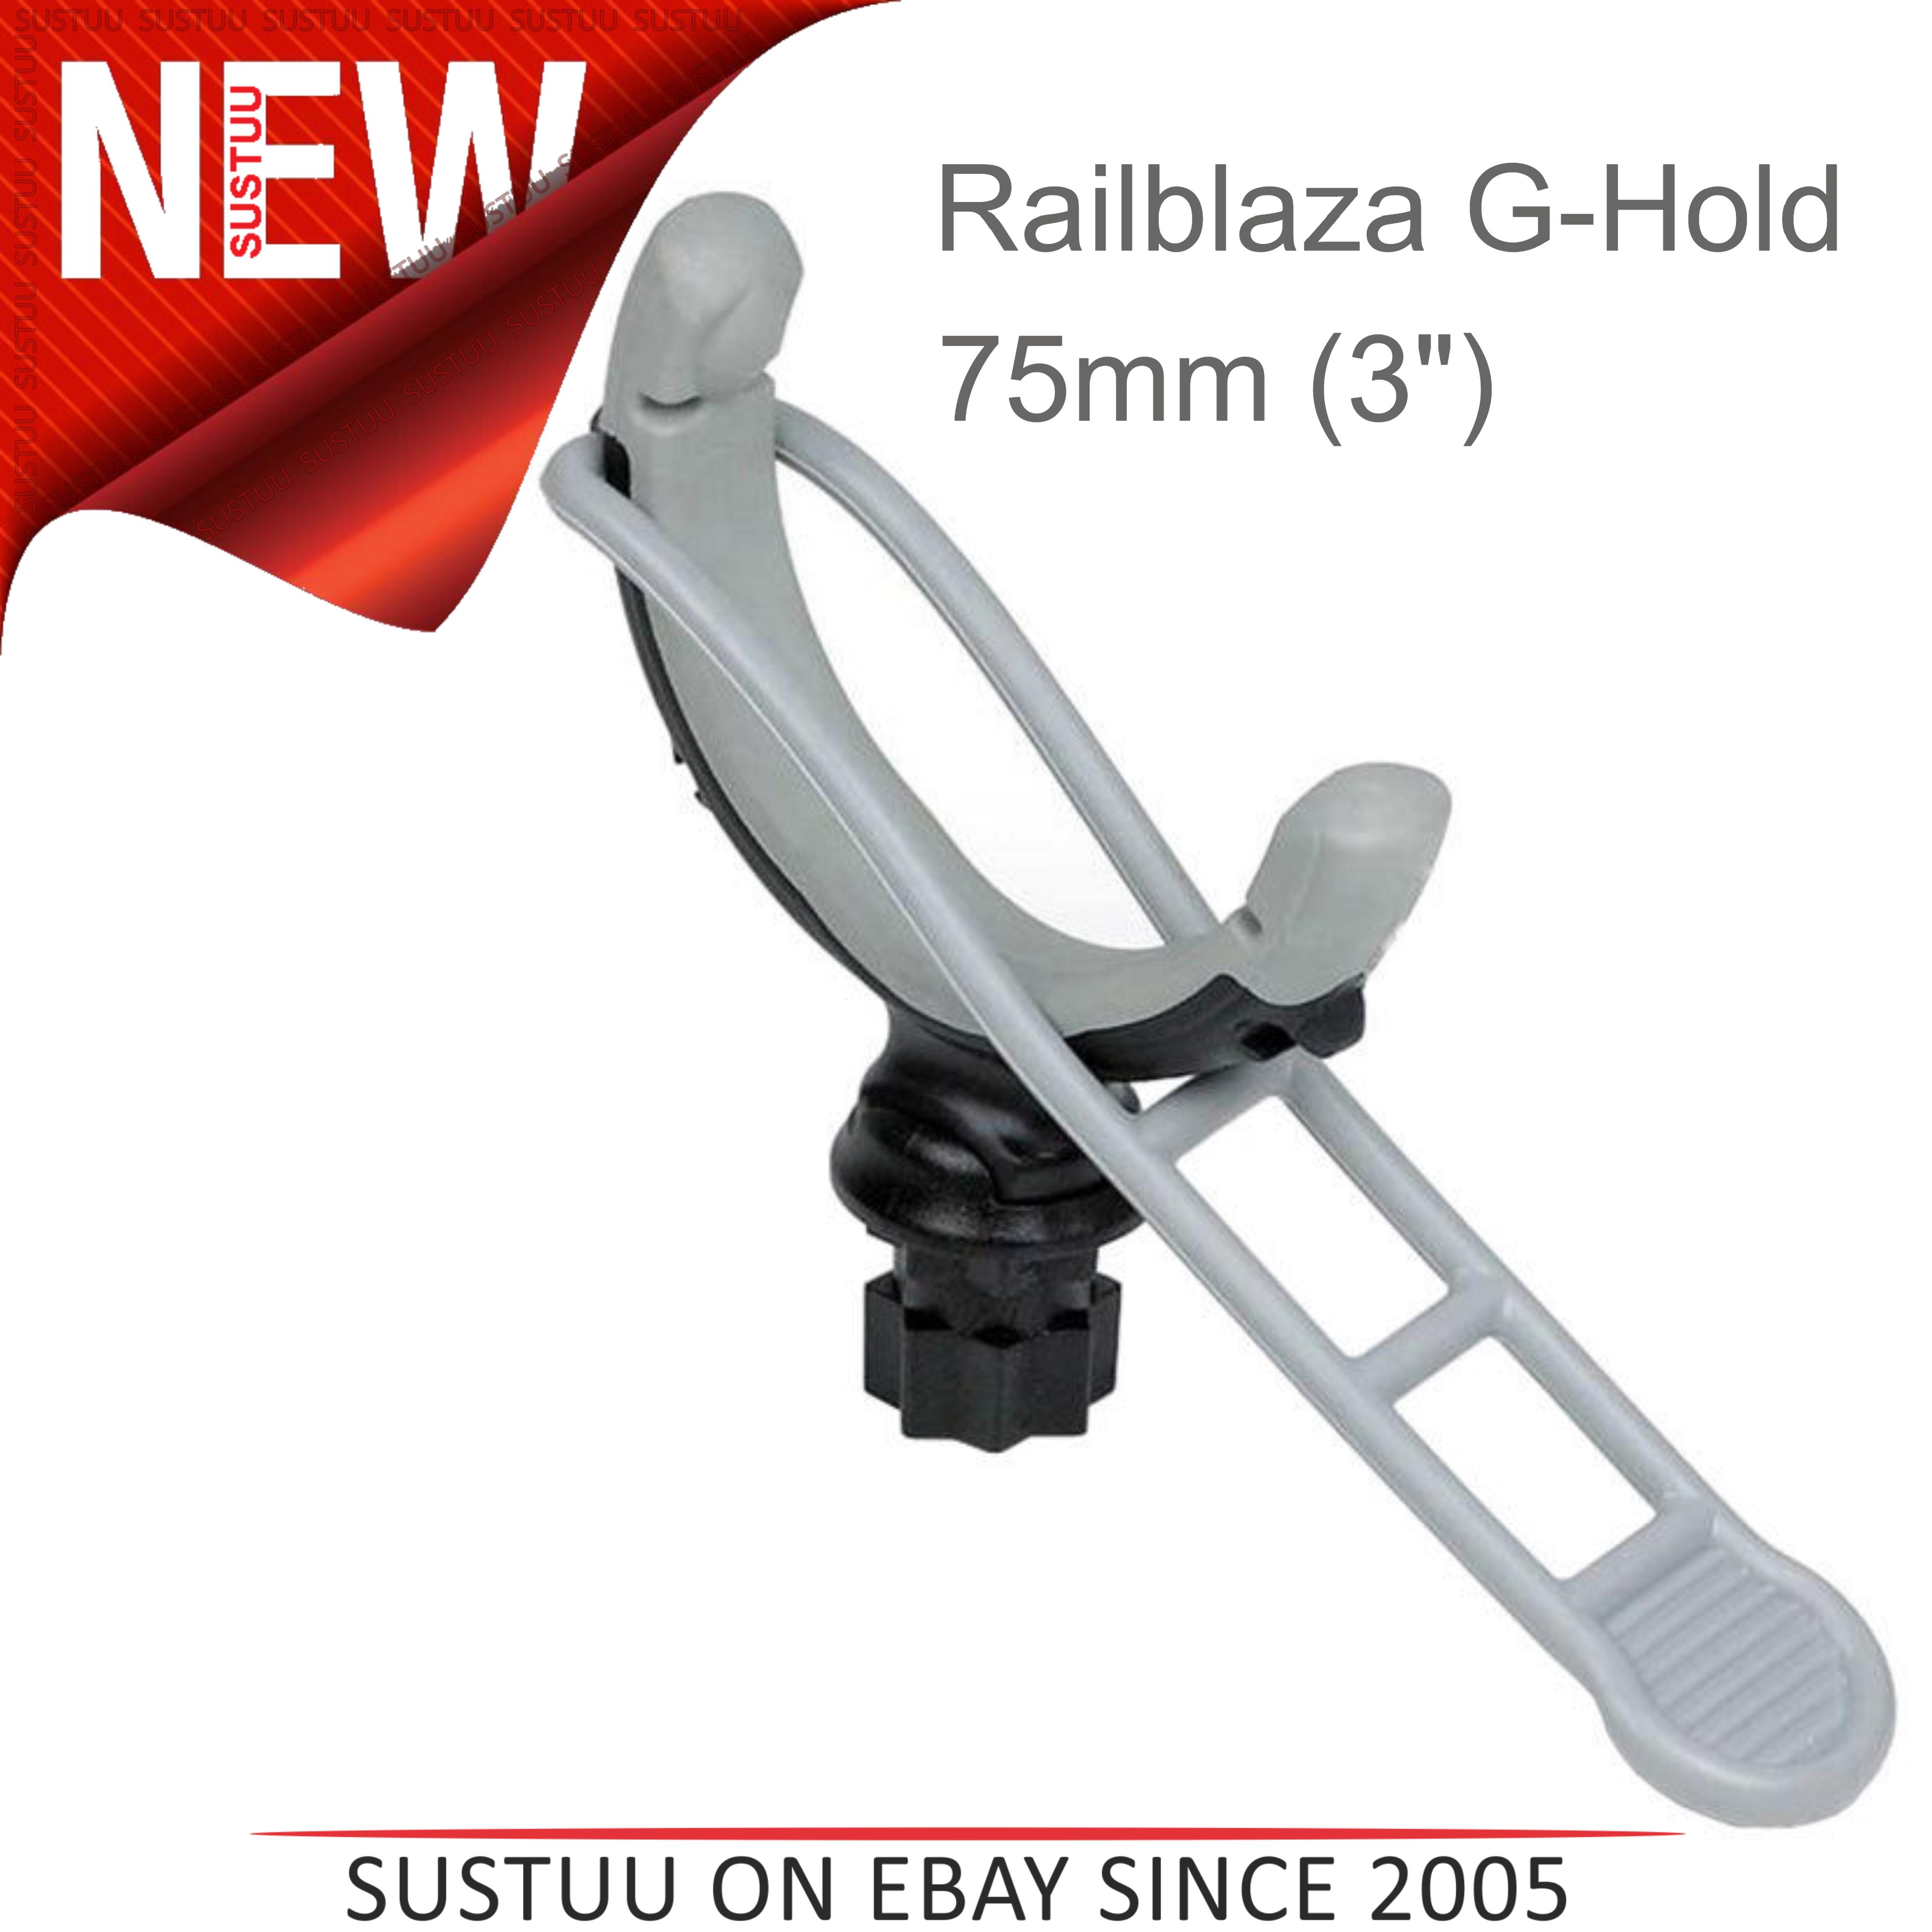 "Railblaza G-Hold 75mm(3"") - Single   For Holds Rod/Poles/Shovels/Boathooks   Black"